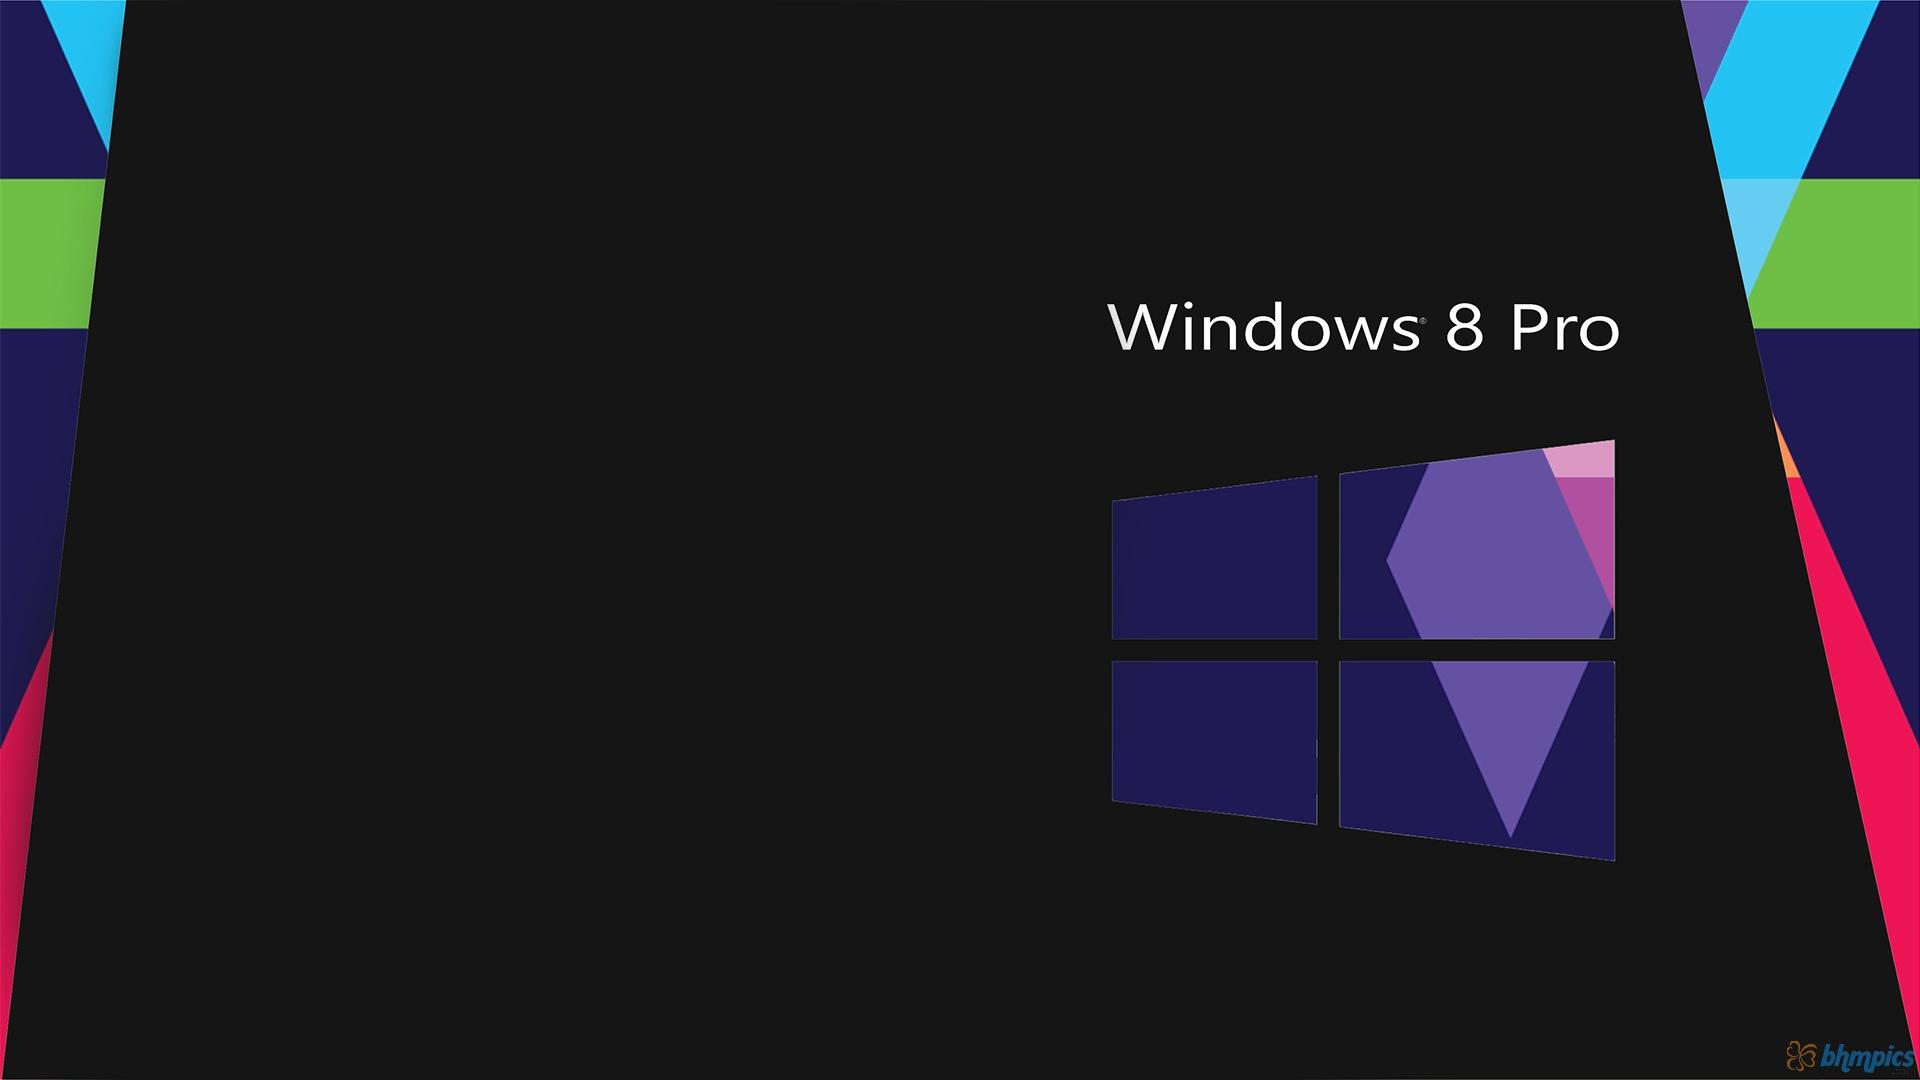 Windows On Black Hd Desktop Wallpaper High Definition 1920x1080